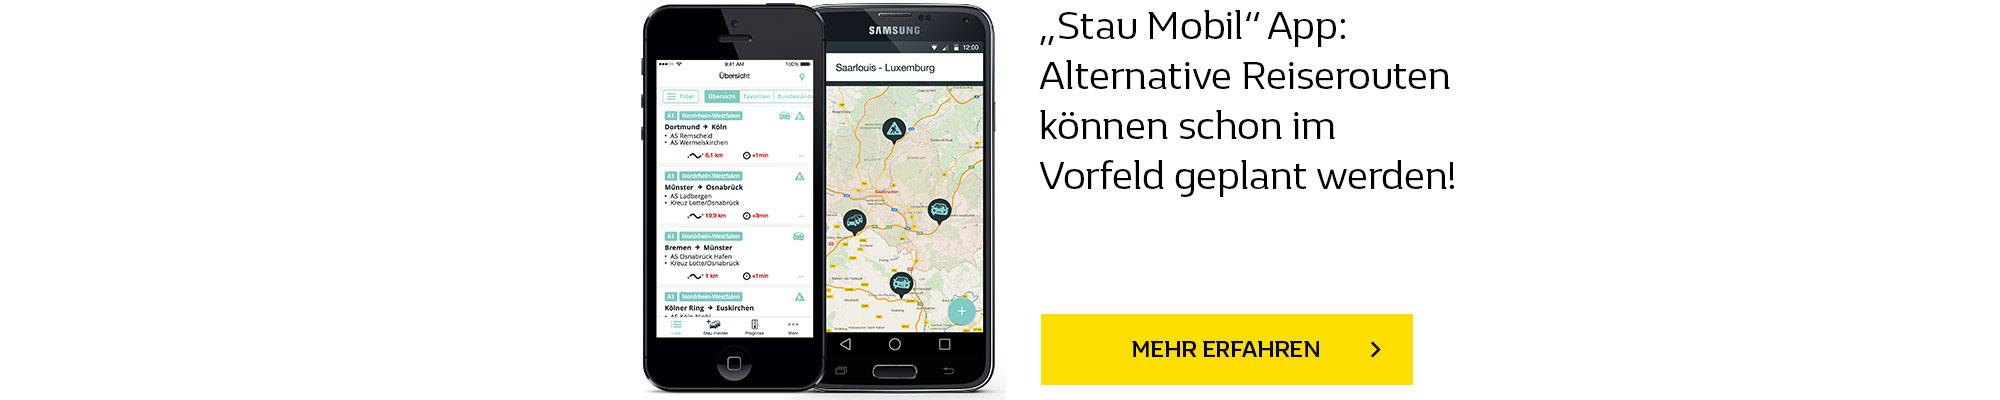 Stau Mobil App